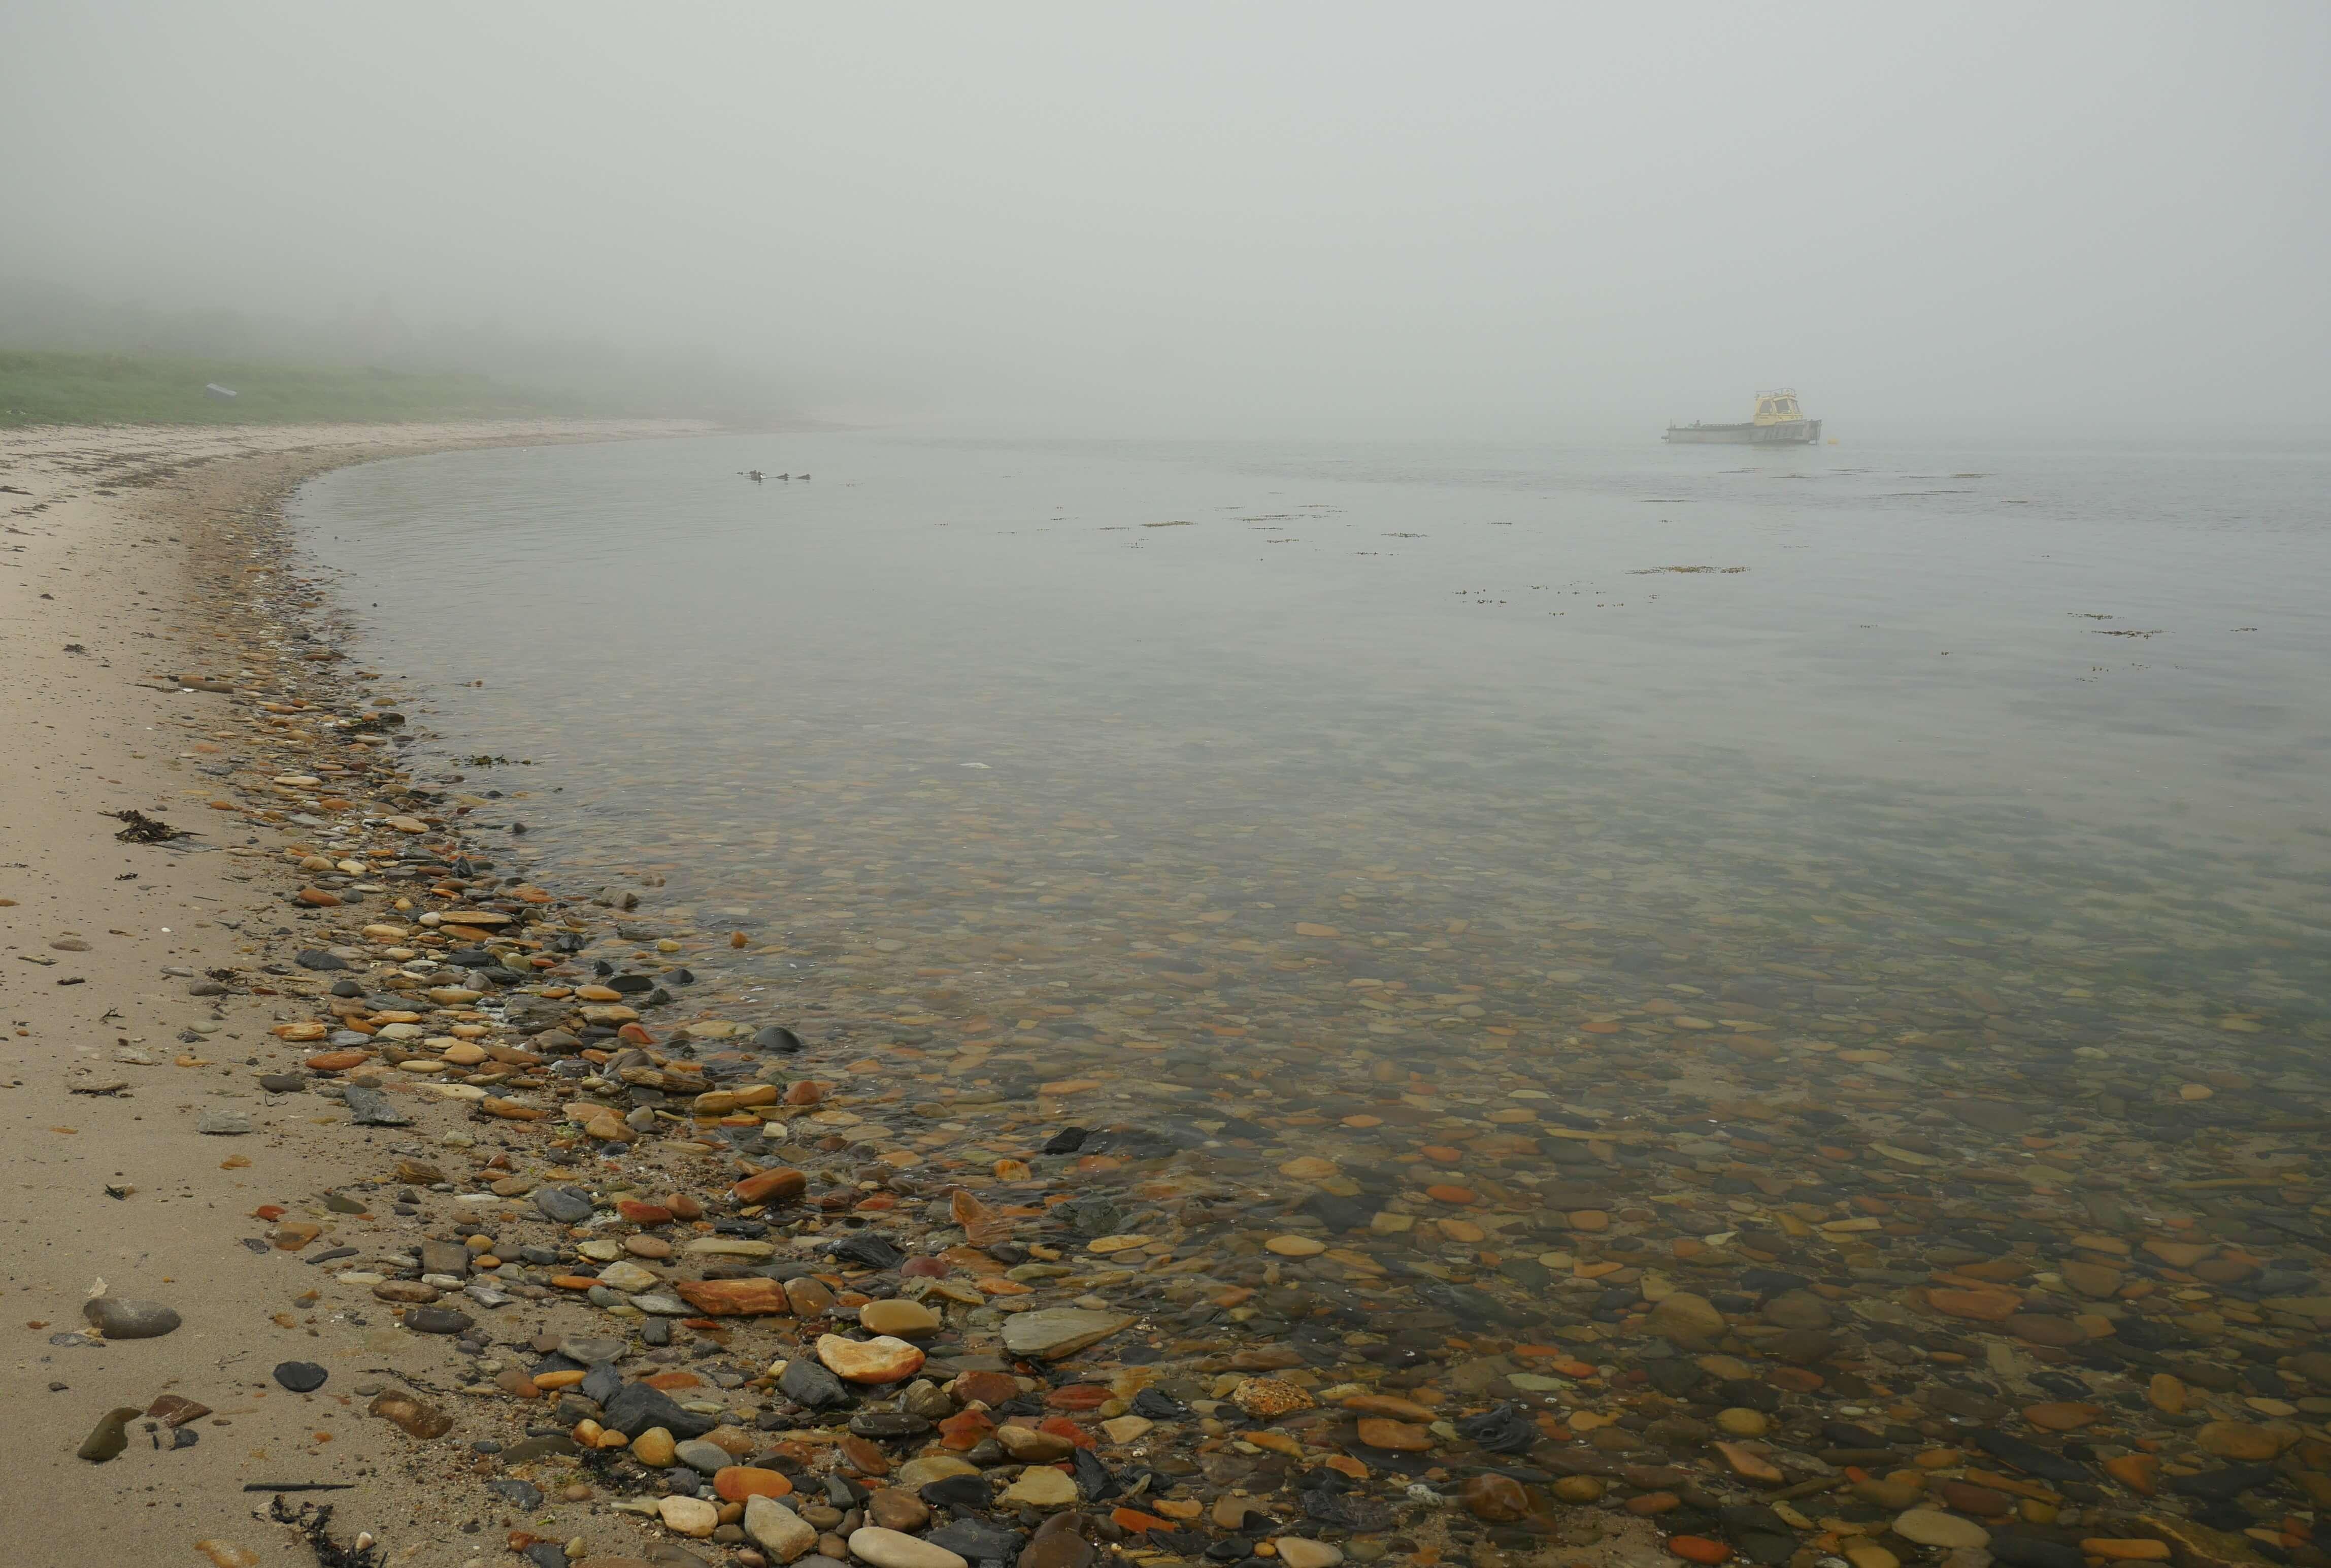 Misty beach, island of Hoy, Orkney, Scotland, UK